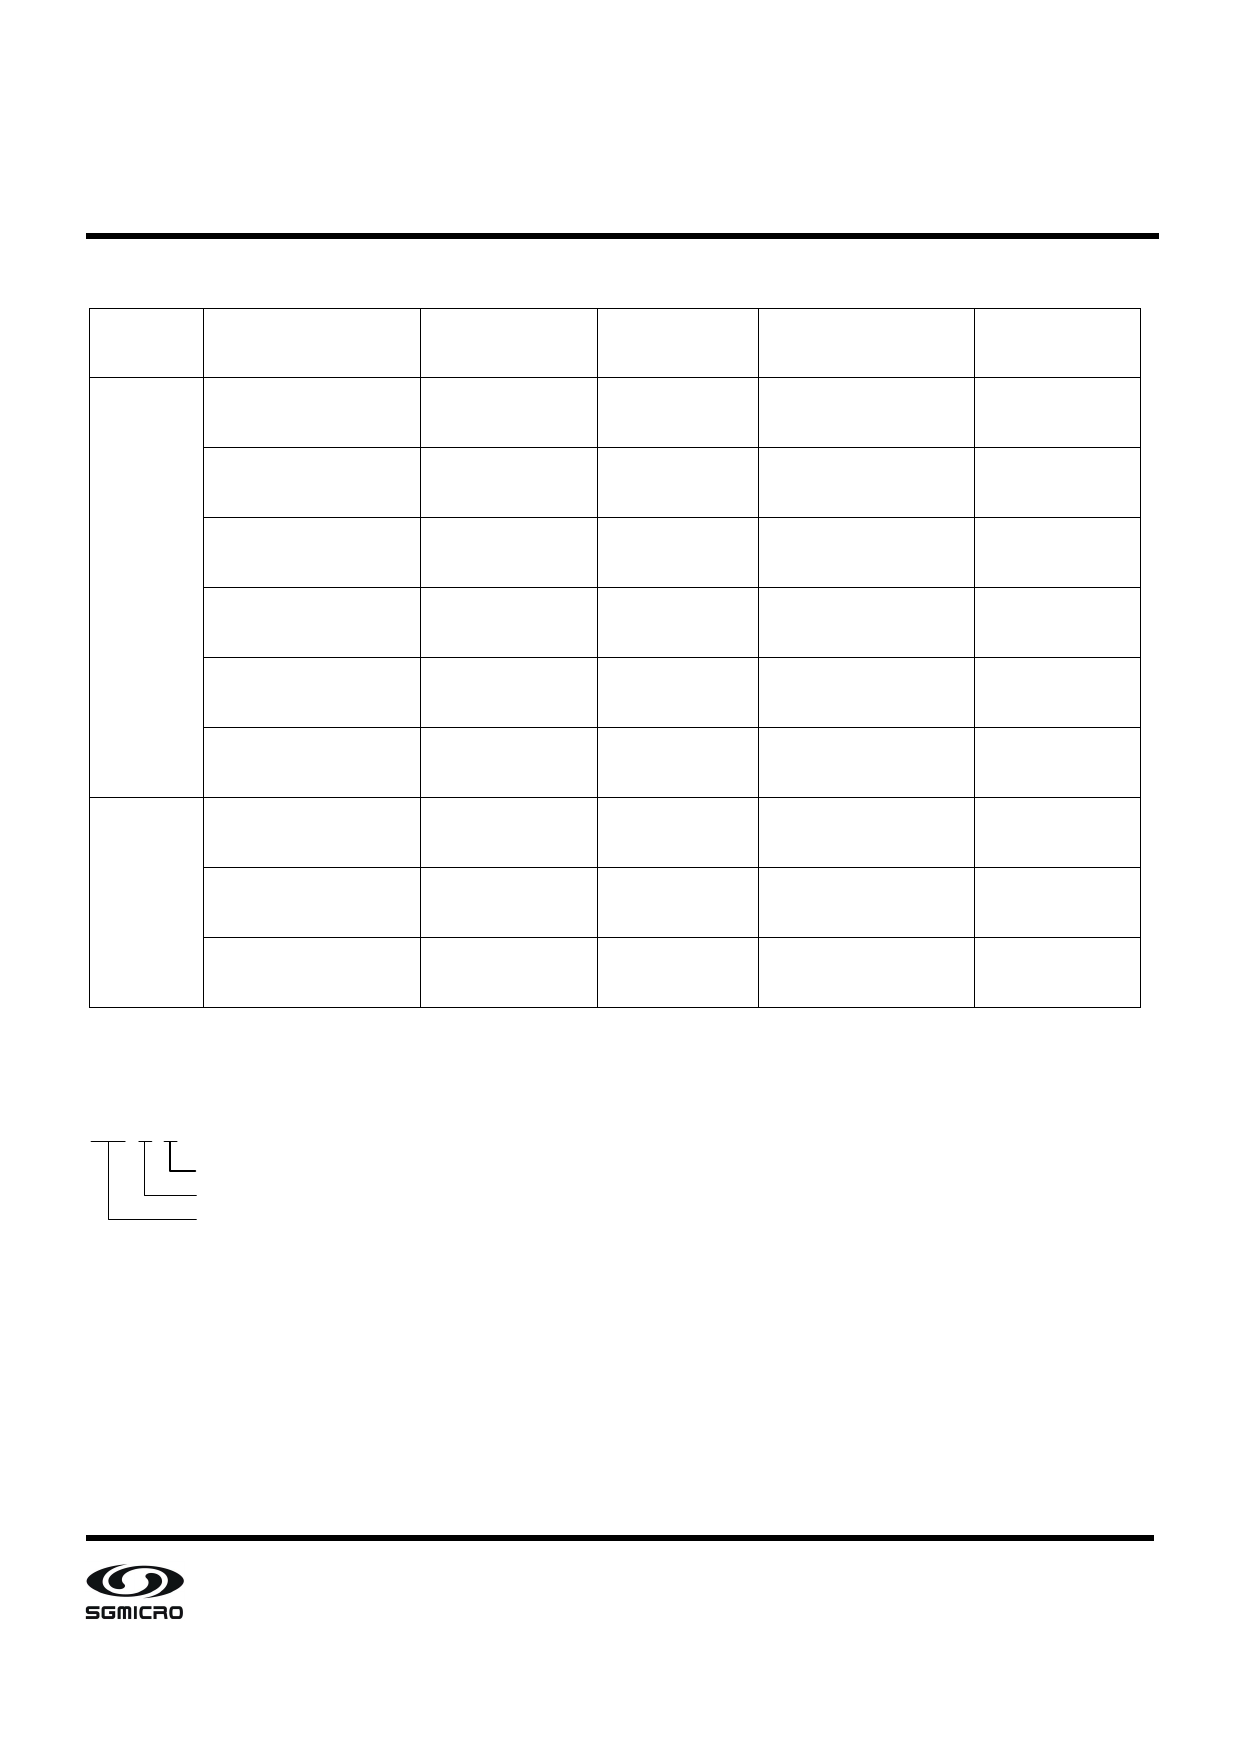 SGM8925 pdf, schematic